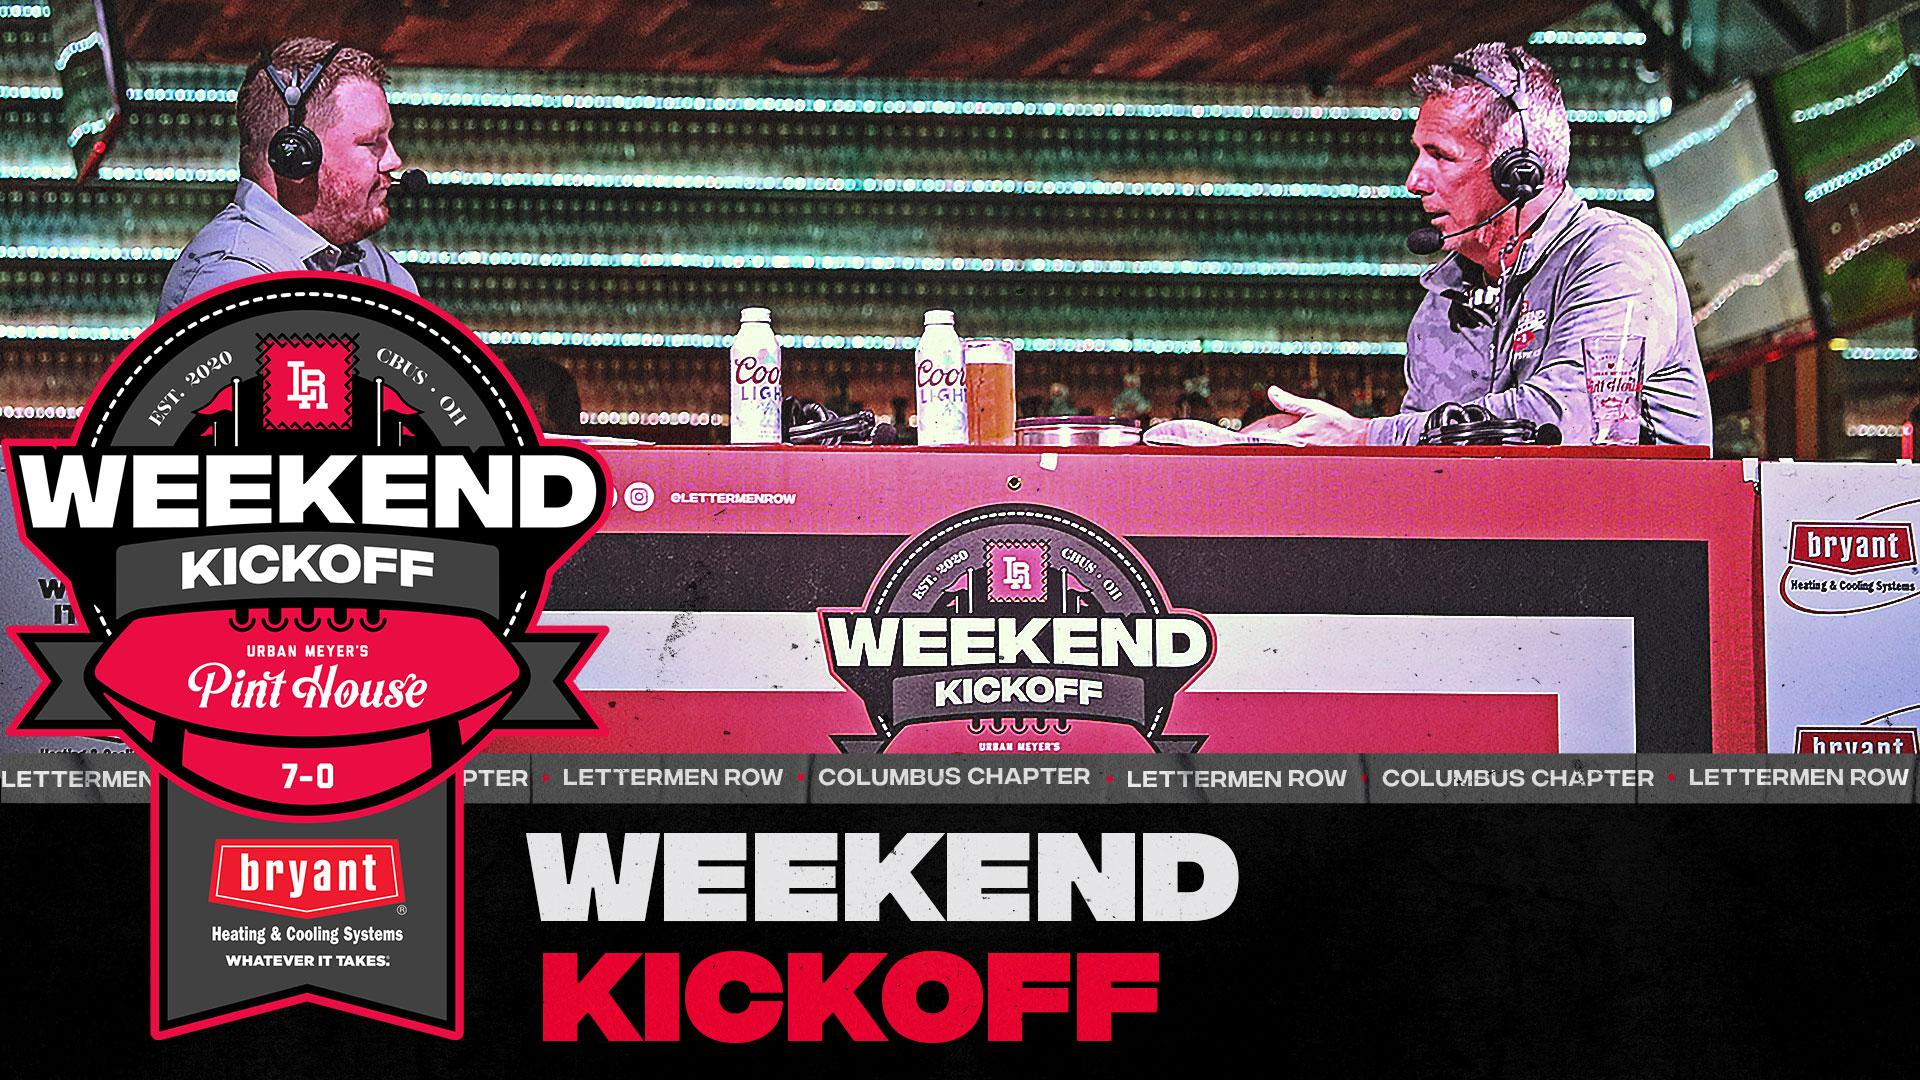 ohio state football - weekend kickoff - urban meyer